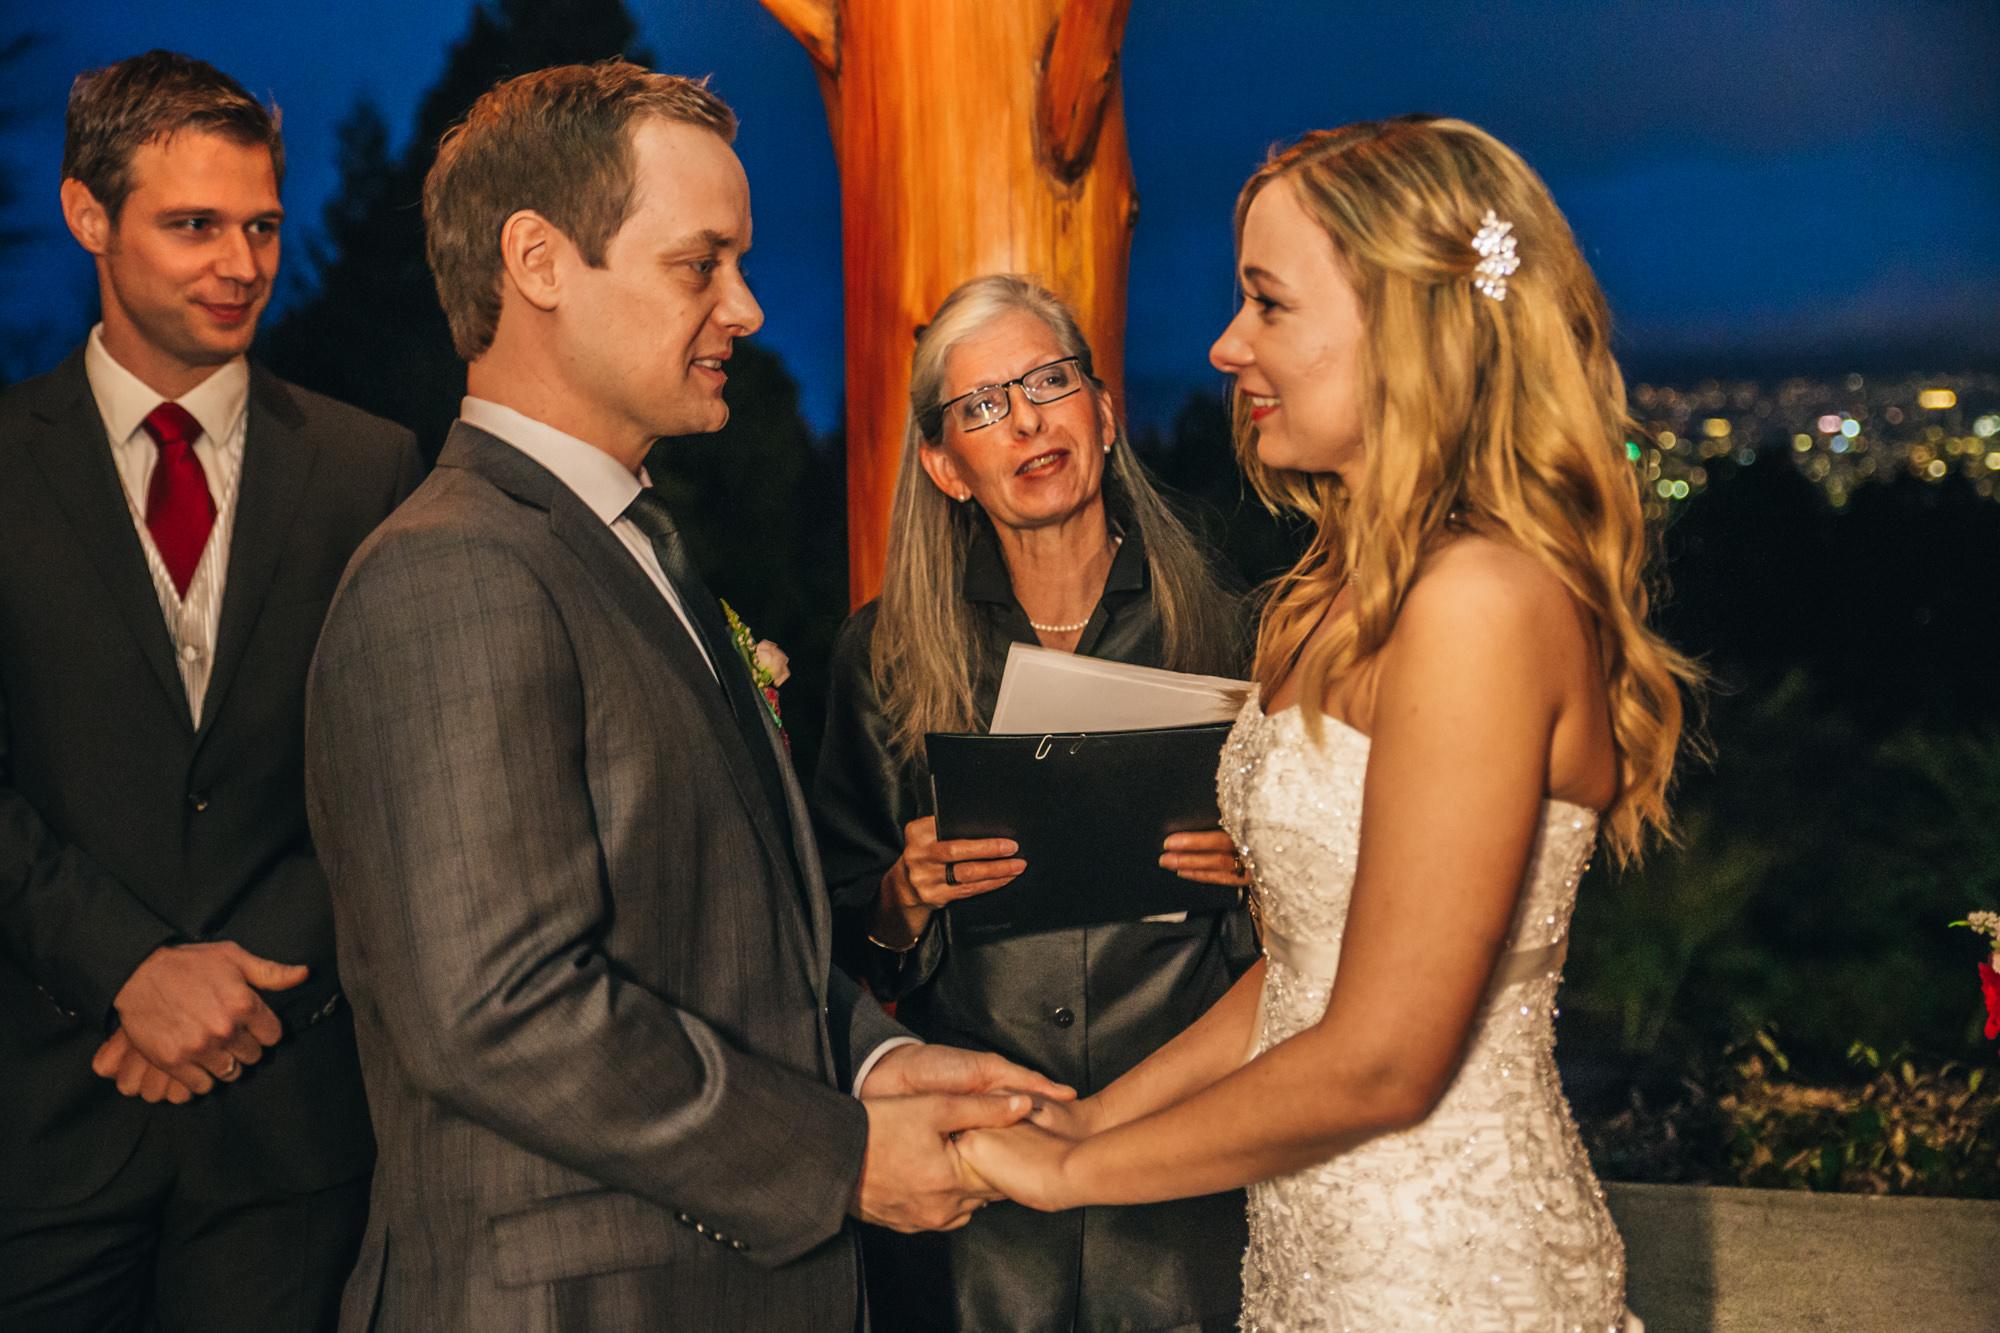 33-seasons-in-the-park-wedding-ceremony.jpg